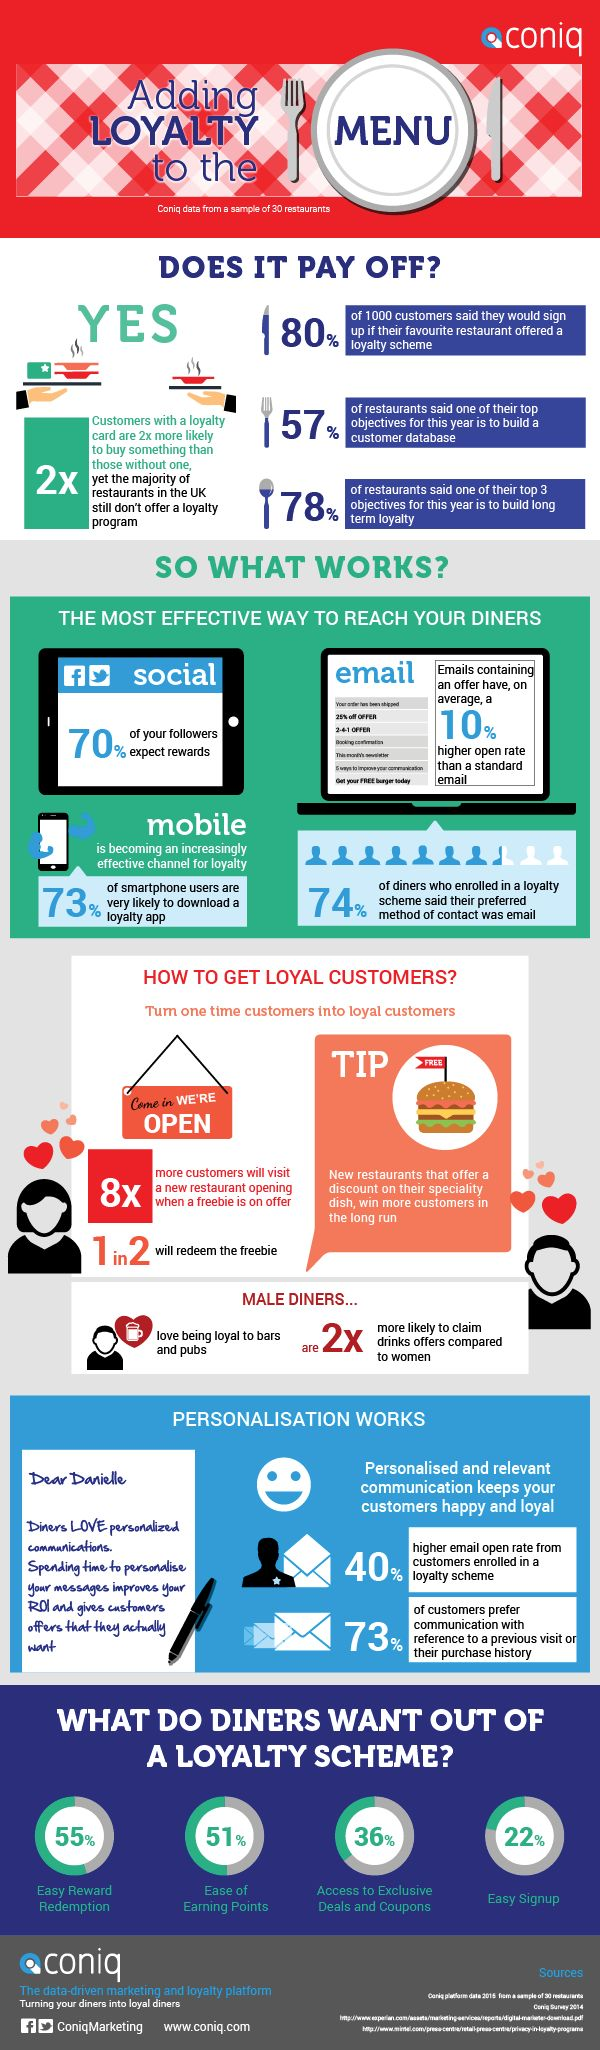 Adding Loyalty to the Menu #infographic #LoyaltyProgram #HotelMarketing